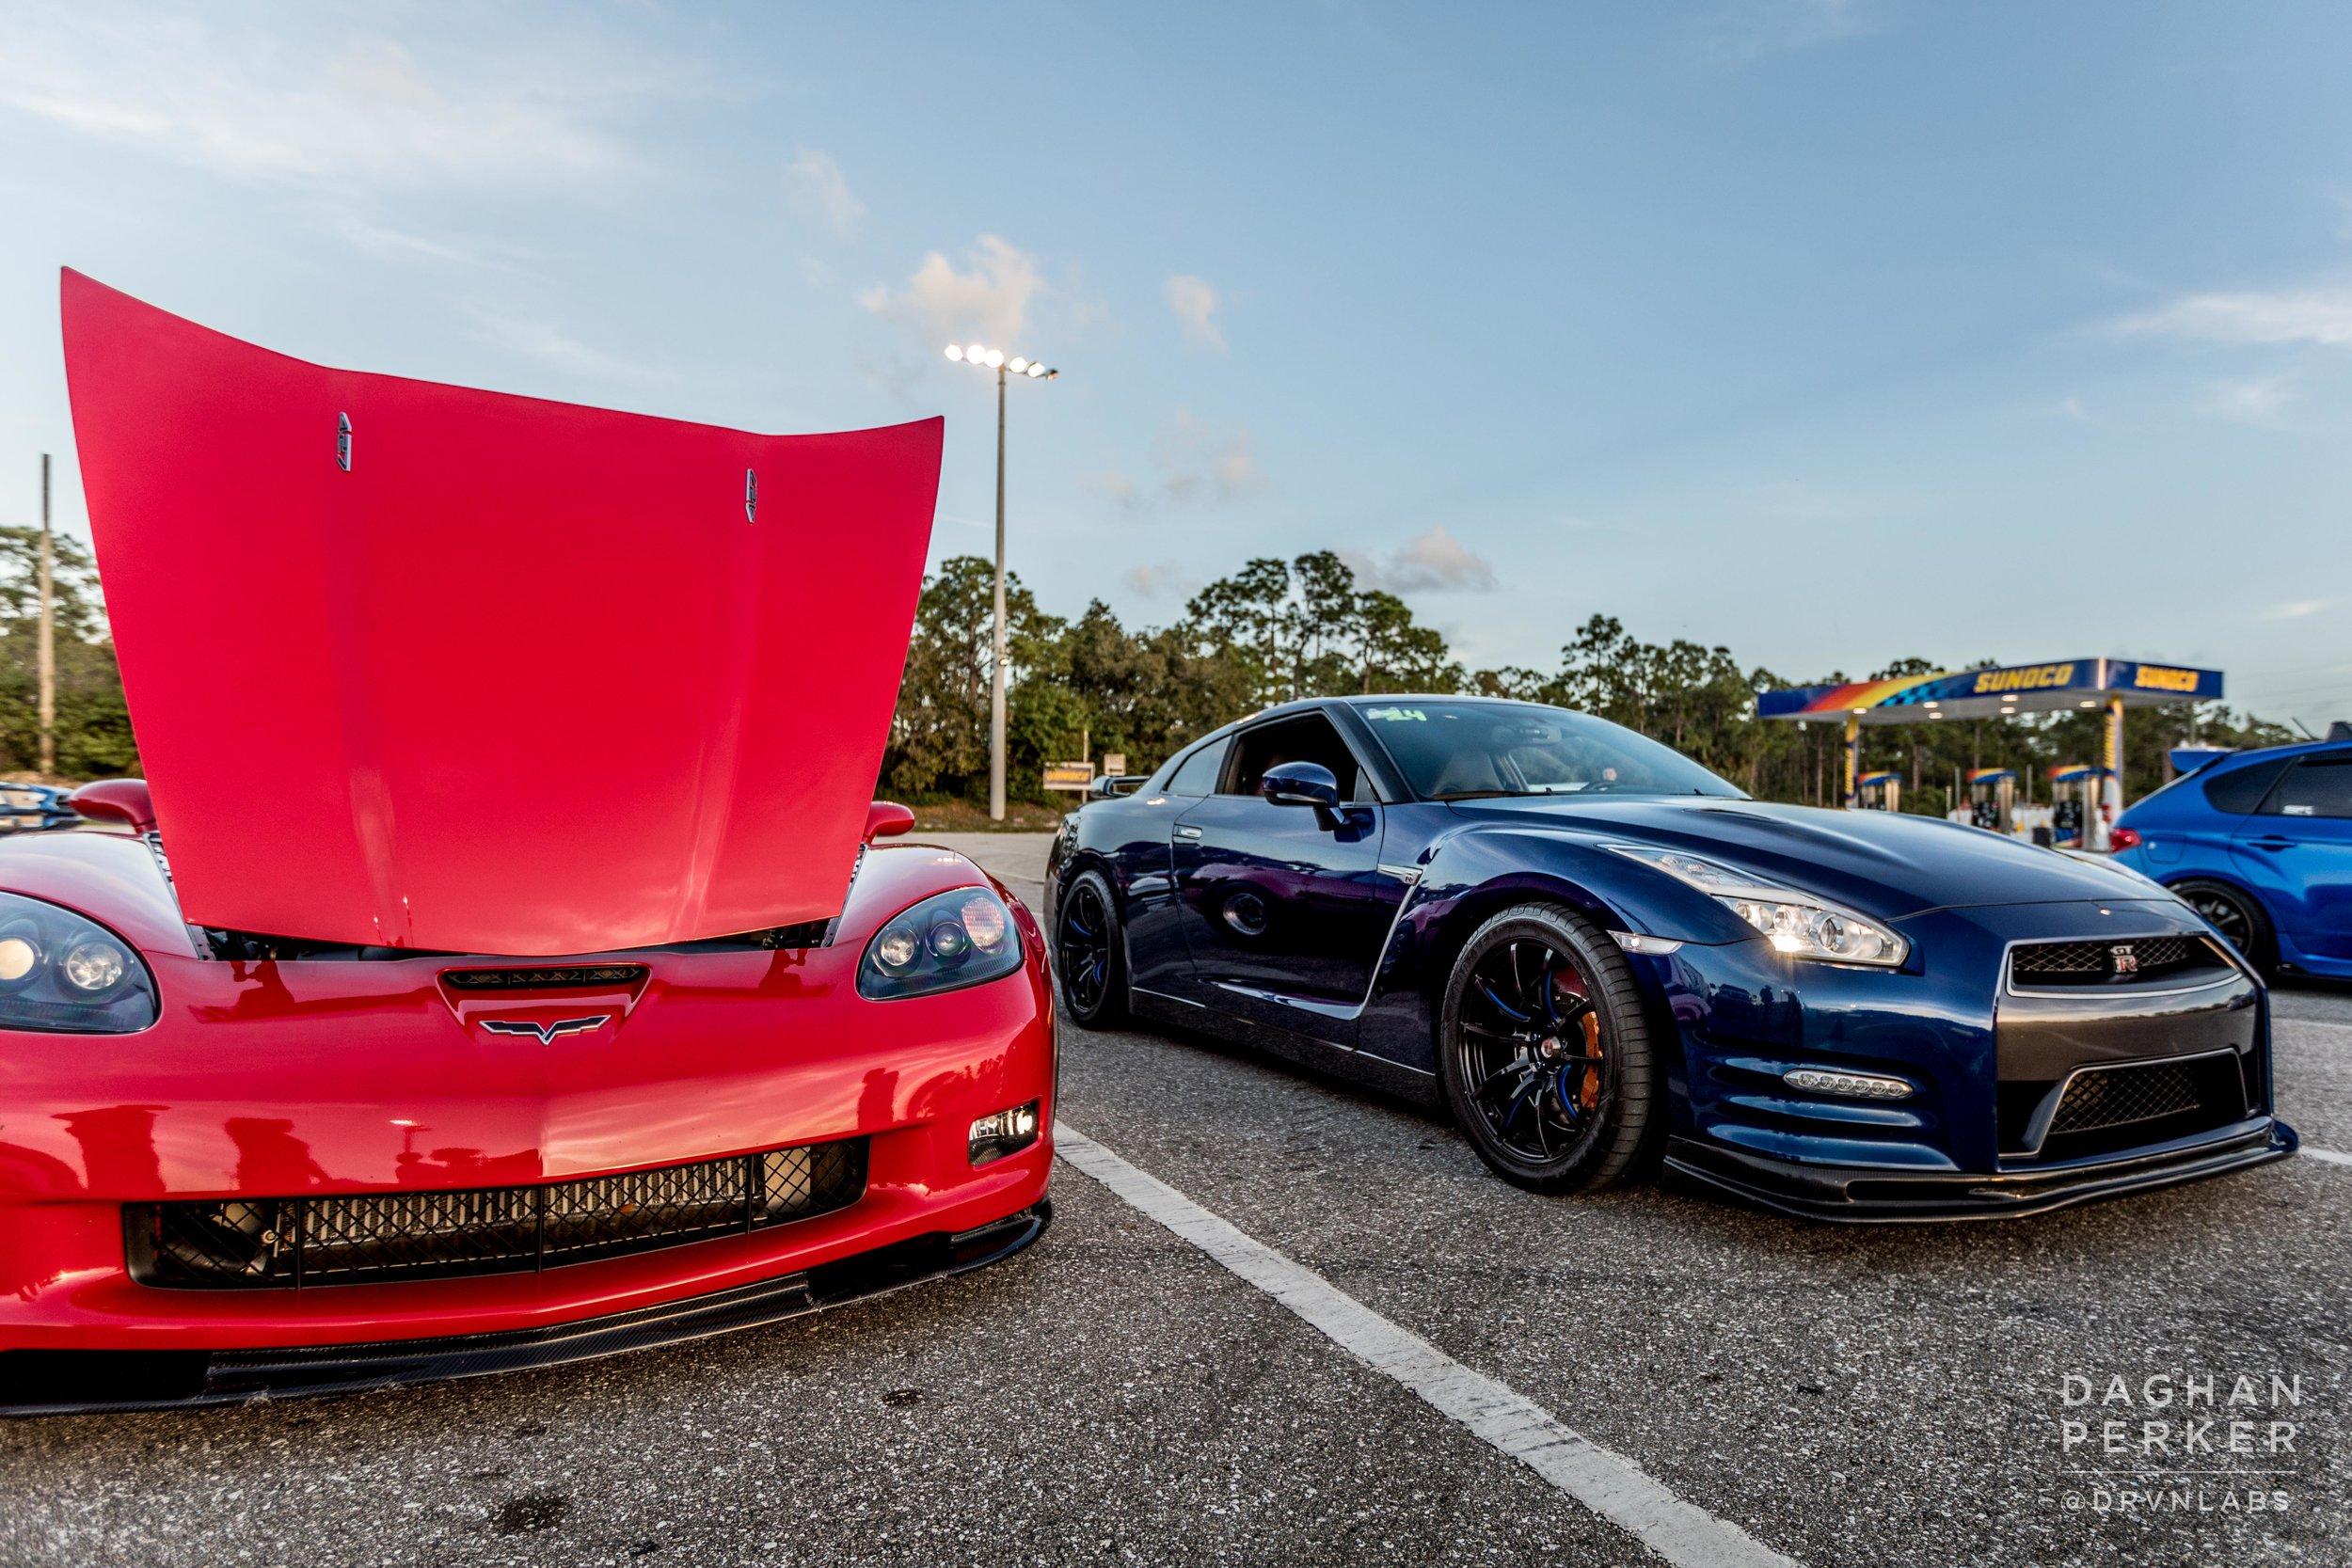 180210-Miami_cars-0432.jpg